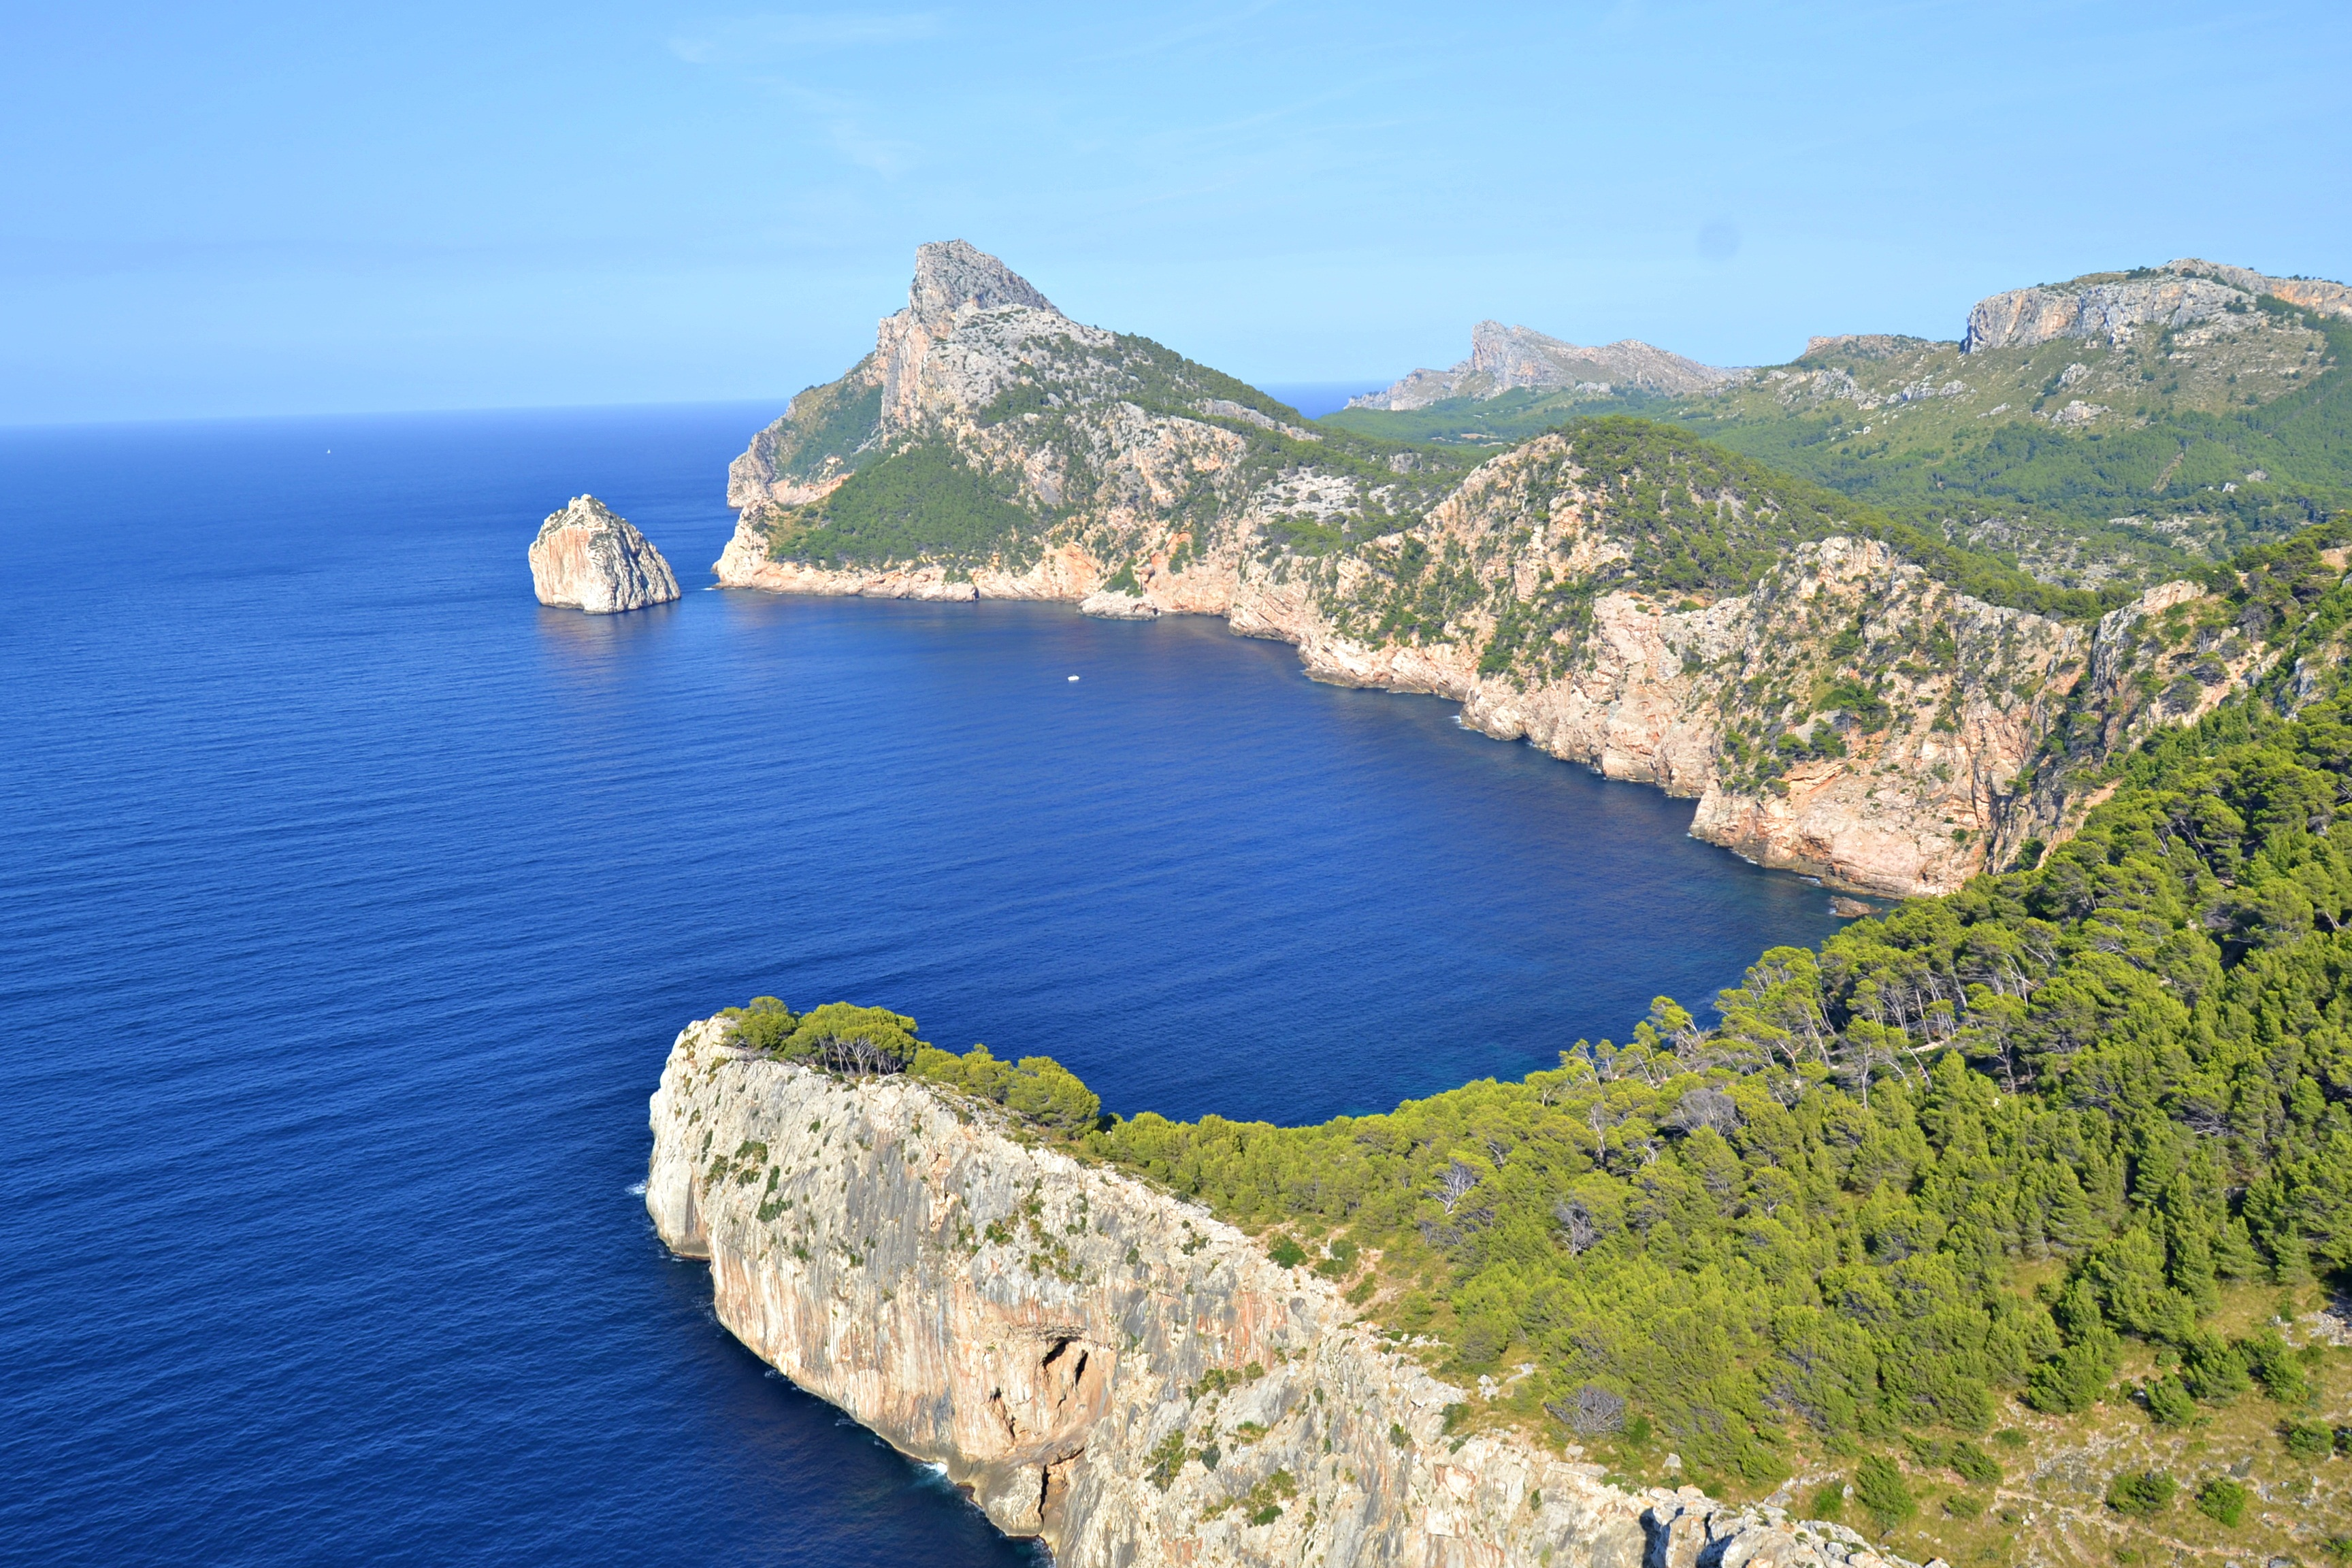 File:Es Cap de Formentor, Serra de Tramuntana, Pollença, Mallorca.JPG -  Wikimedia Commons